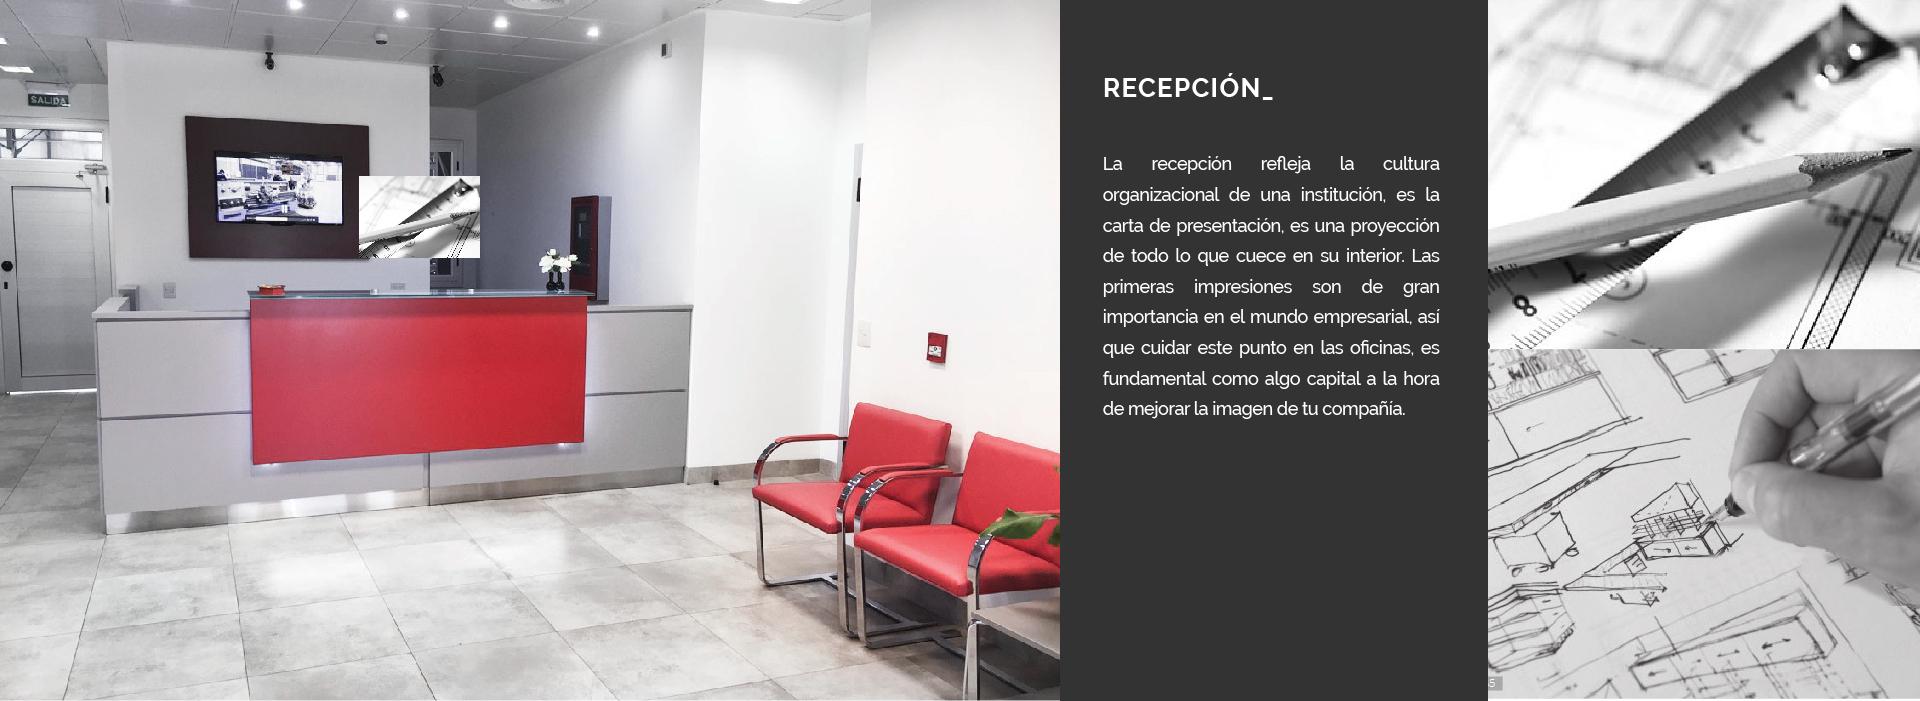 espacios-03